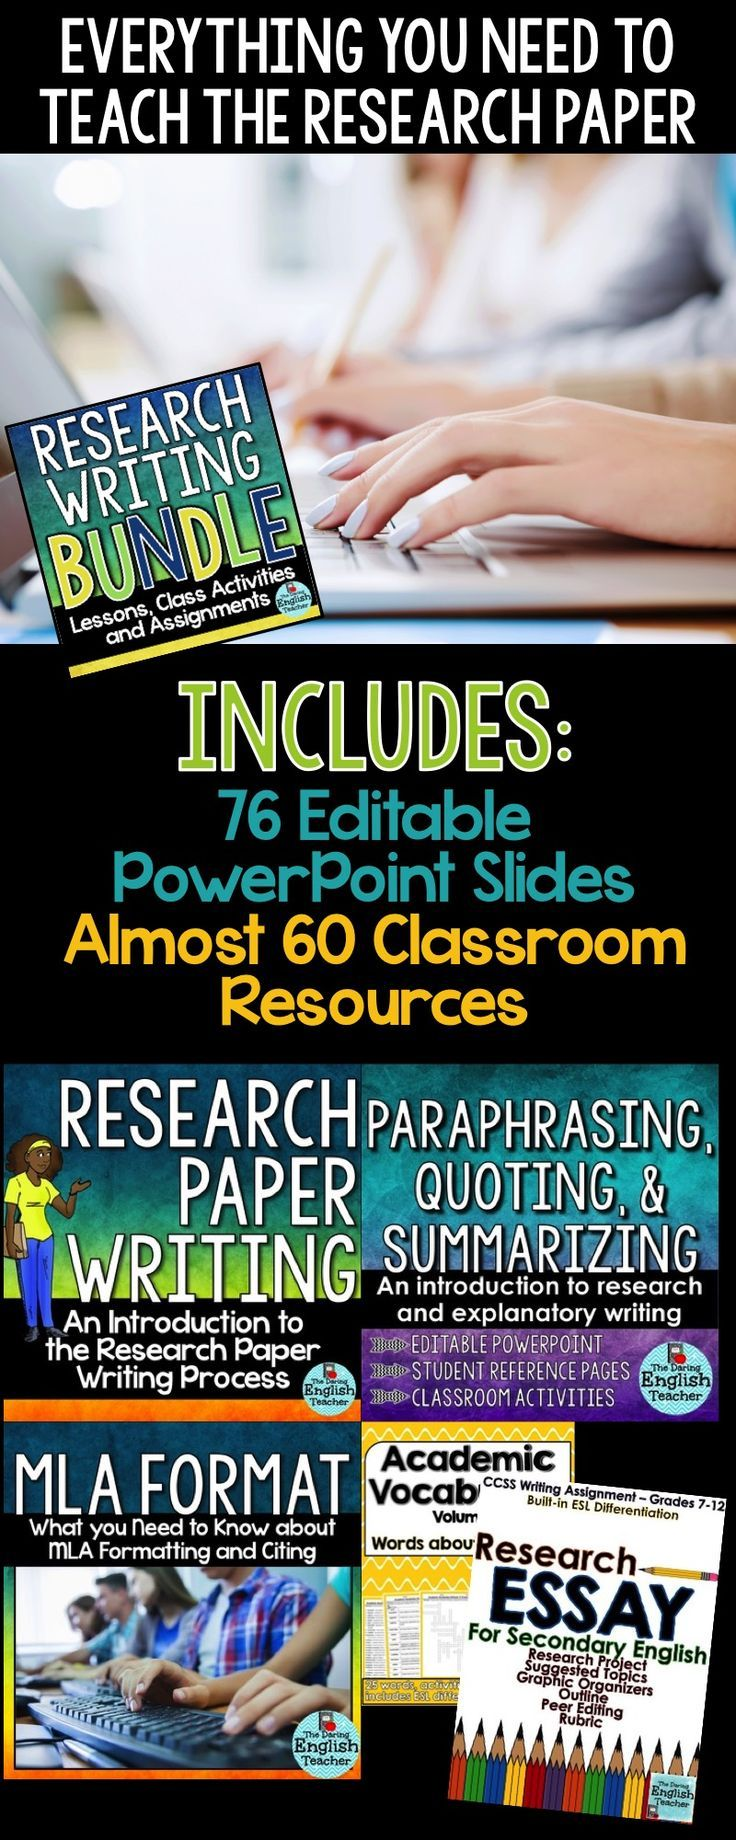 Certified Professional Resume Writer. cheap resume writers ...